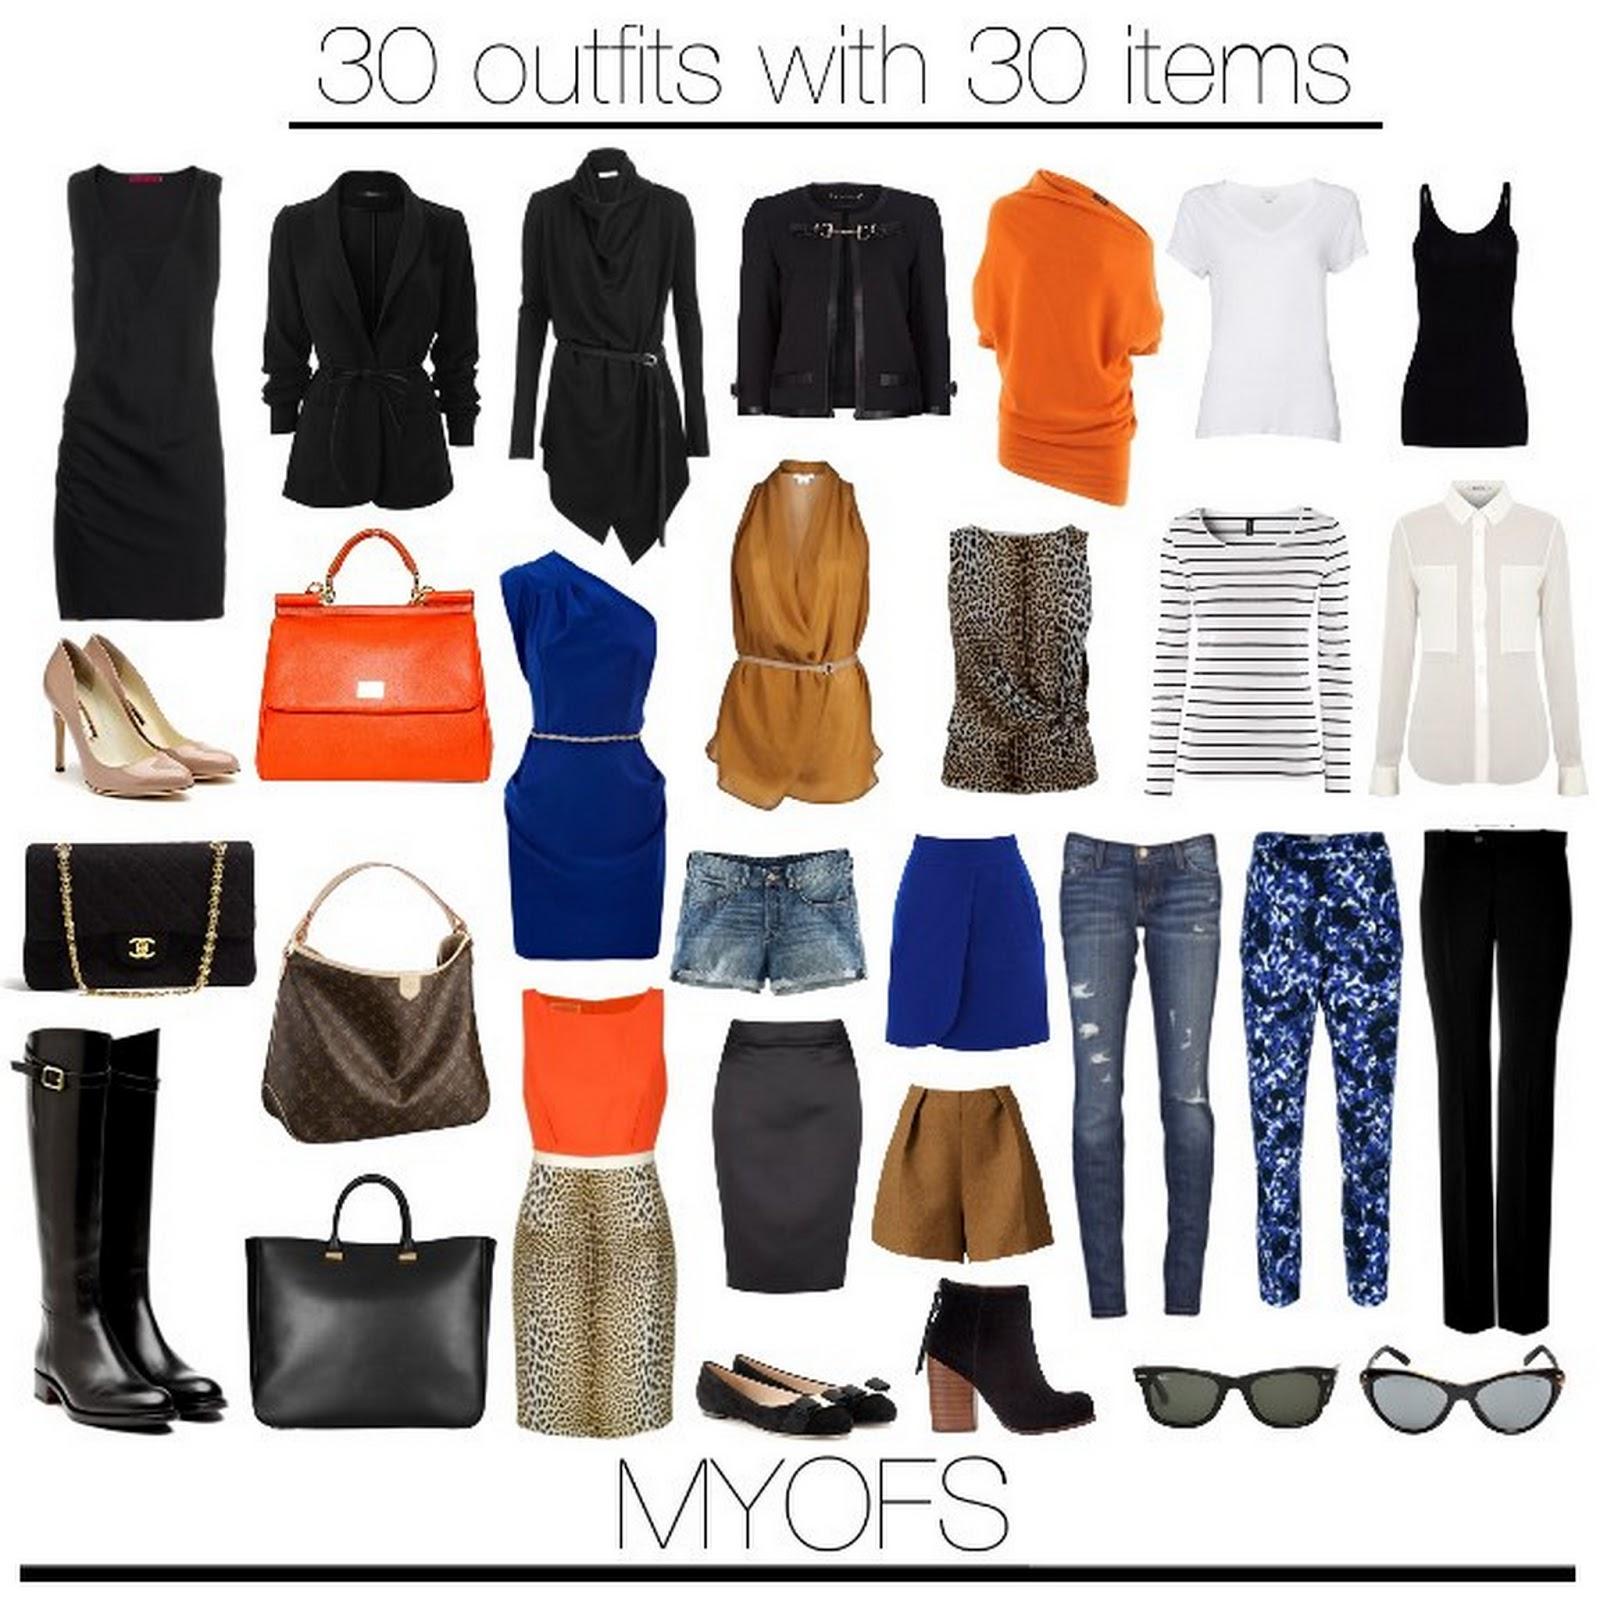 List of fashion items 35